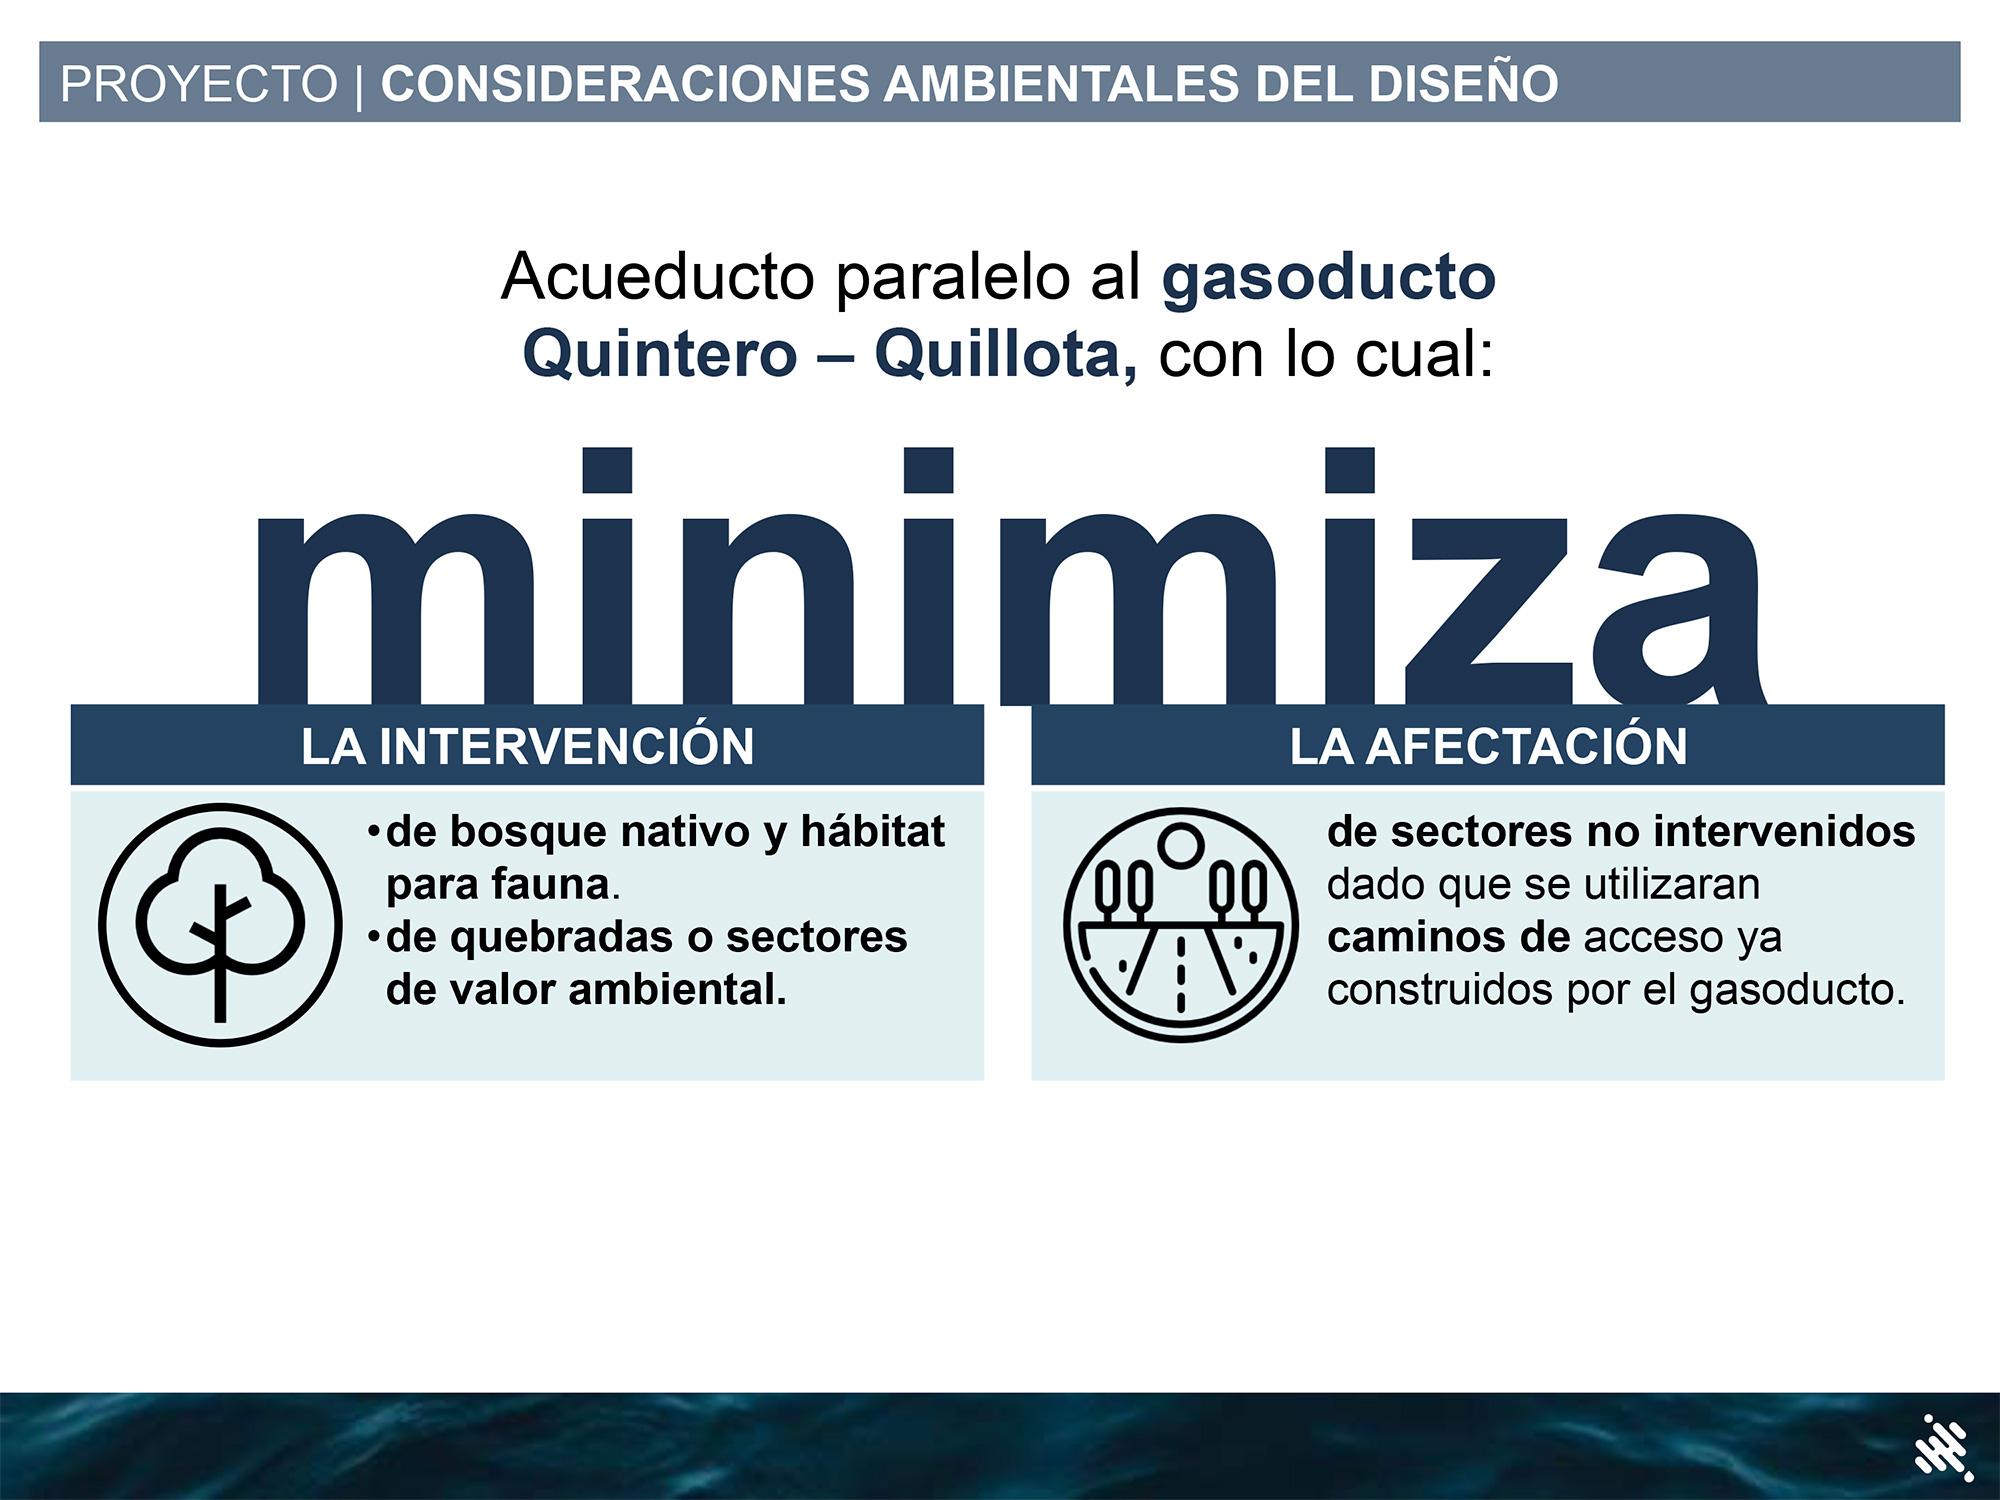 AP_Proyecto_Aconcagua-14.jpg